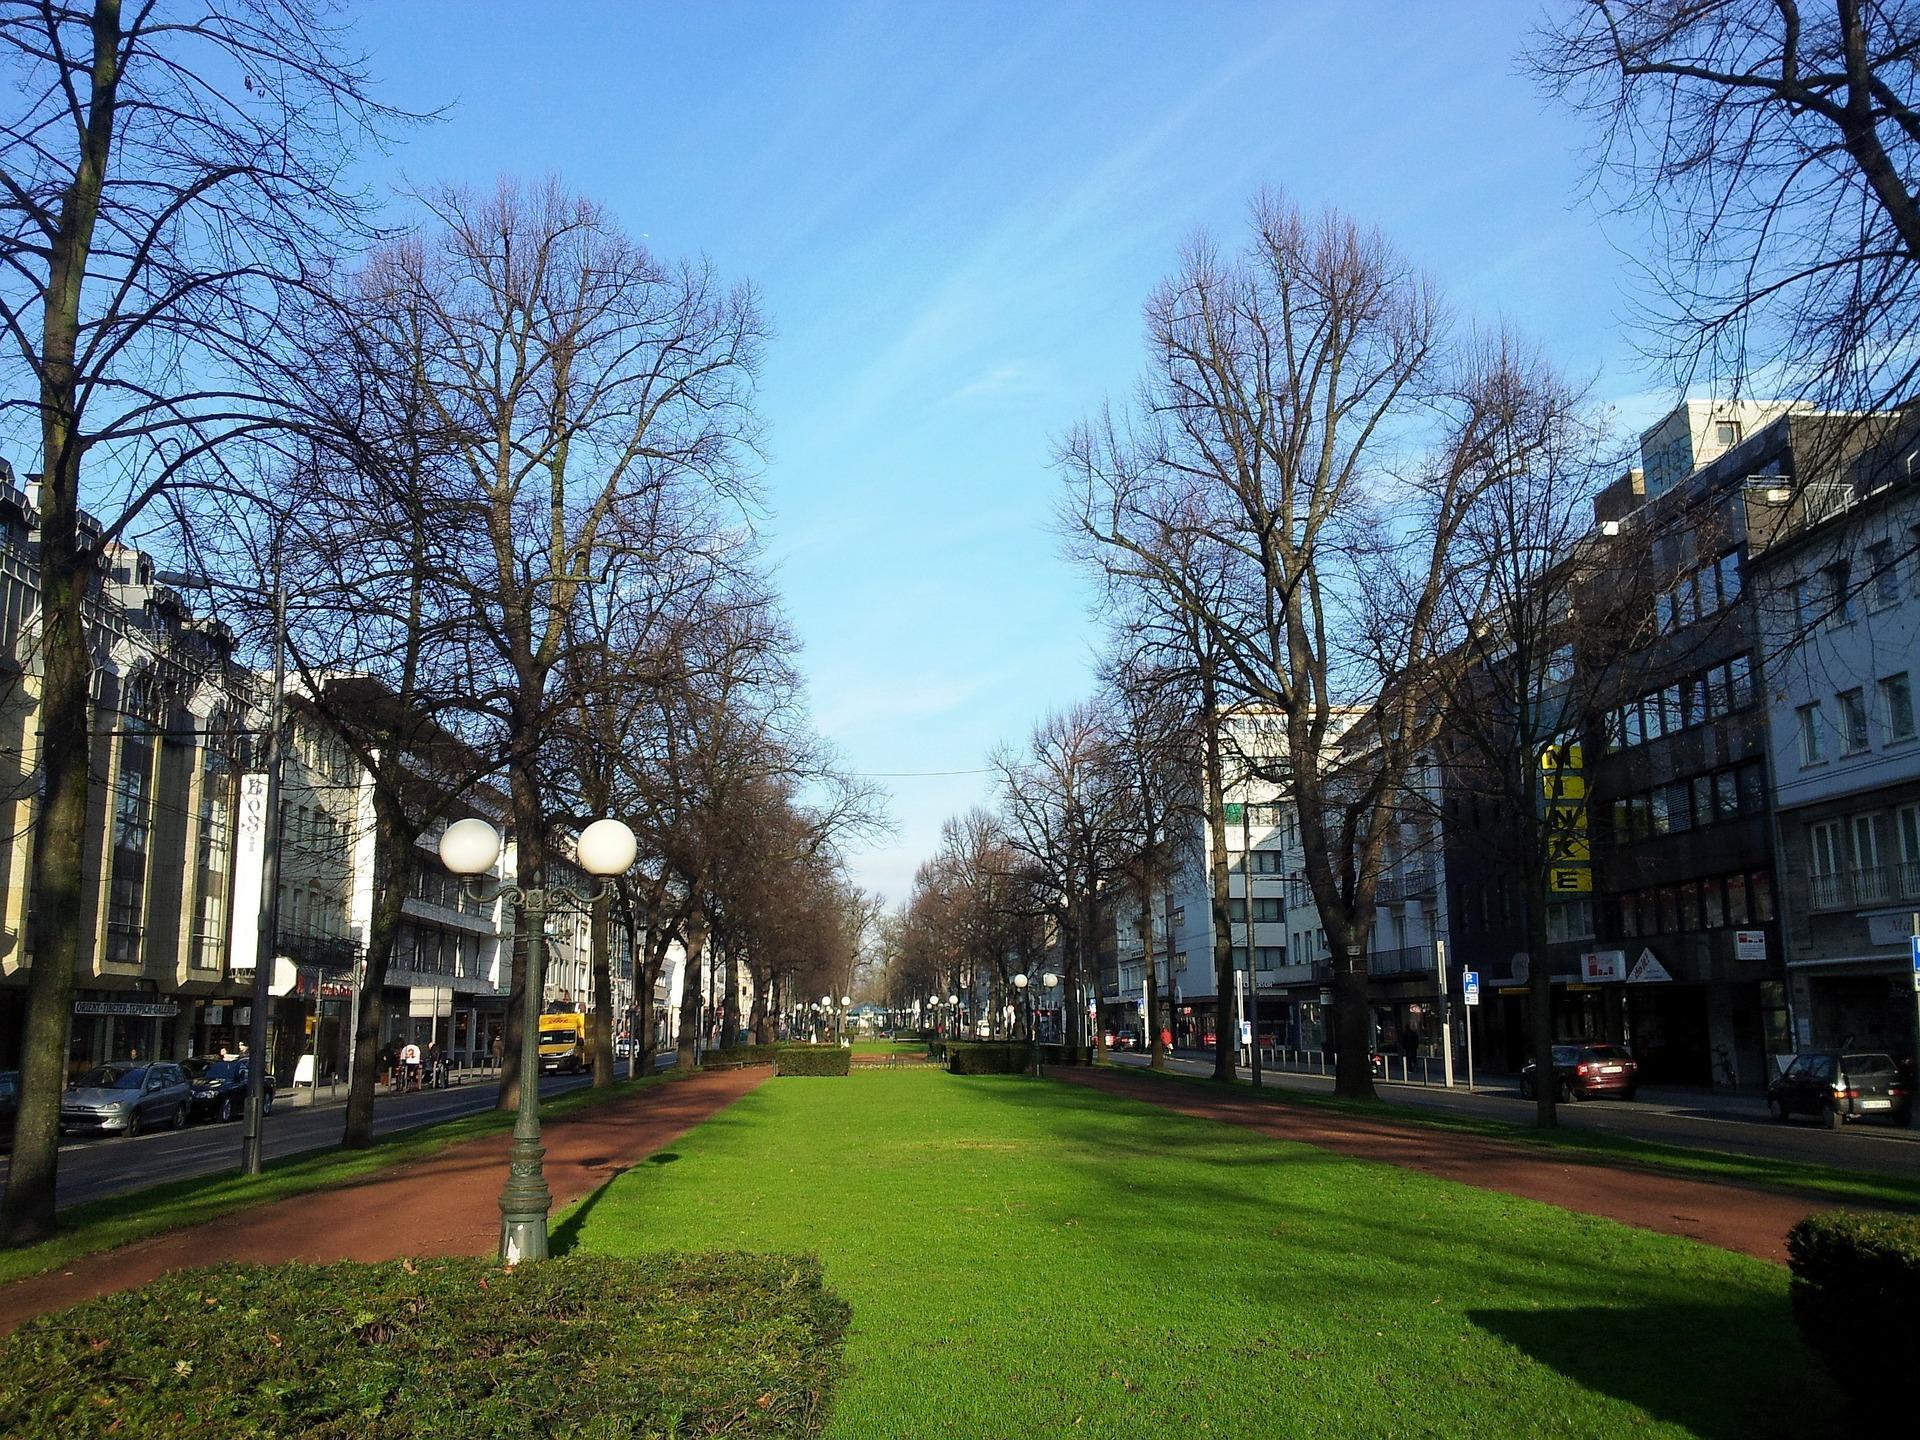 Sozialwohnungen mieten in Krefeld: Jetzt Vermieter kontaktieren